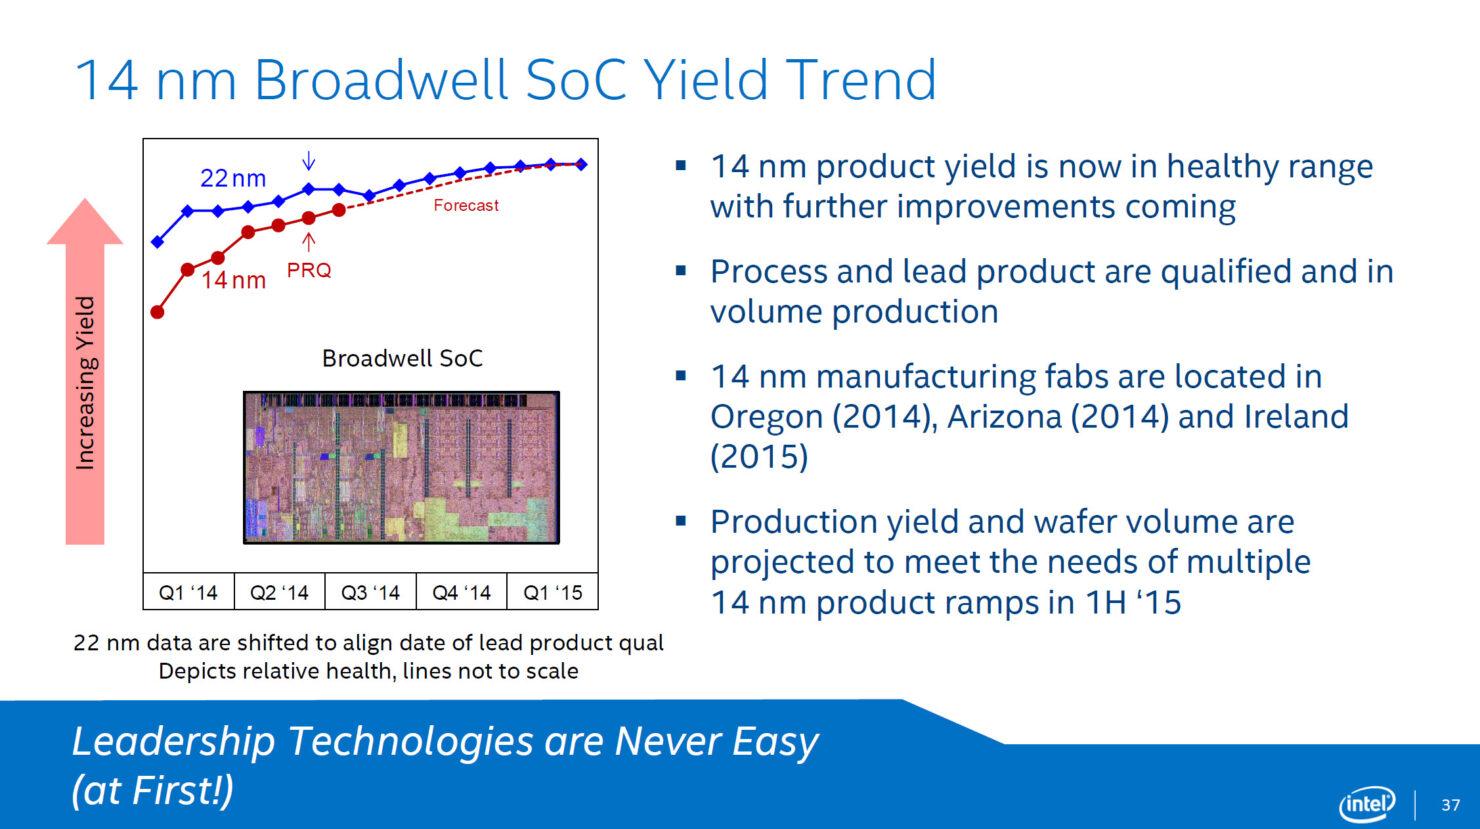 intel-broadwell-14-nm-soc-yield